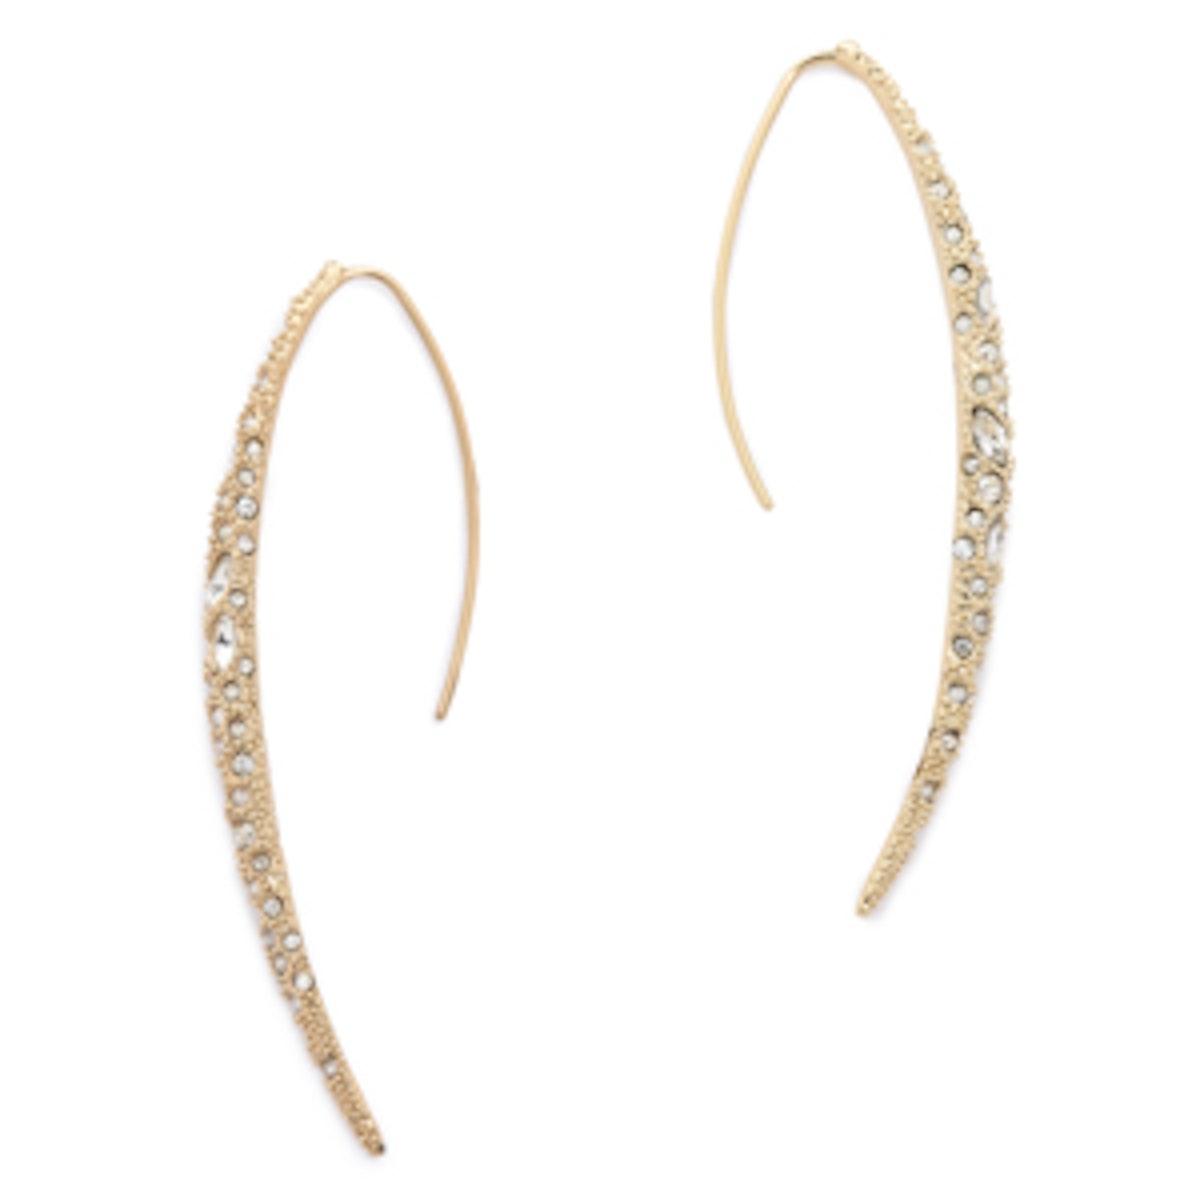 Encrusted Spear Earrings